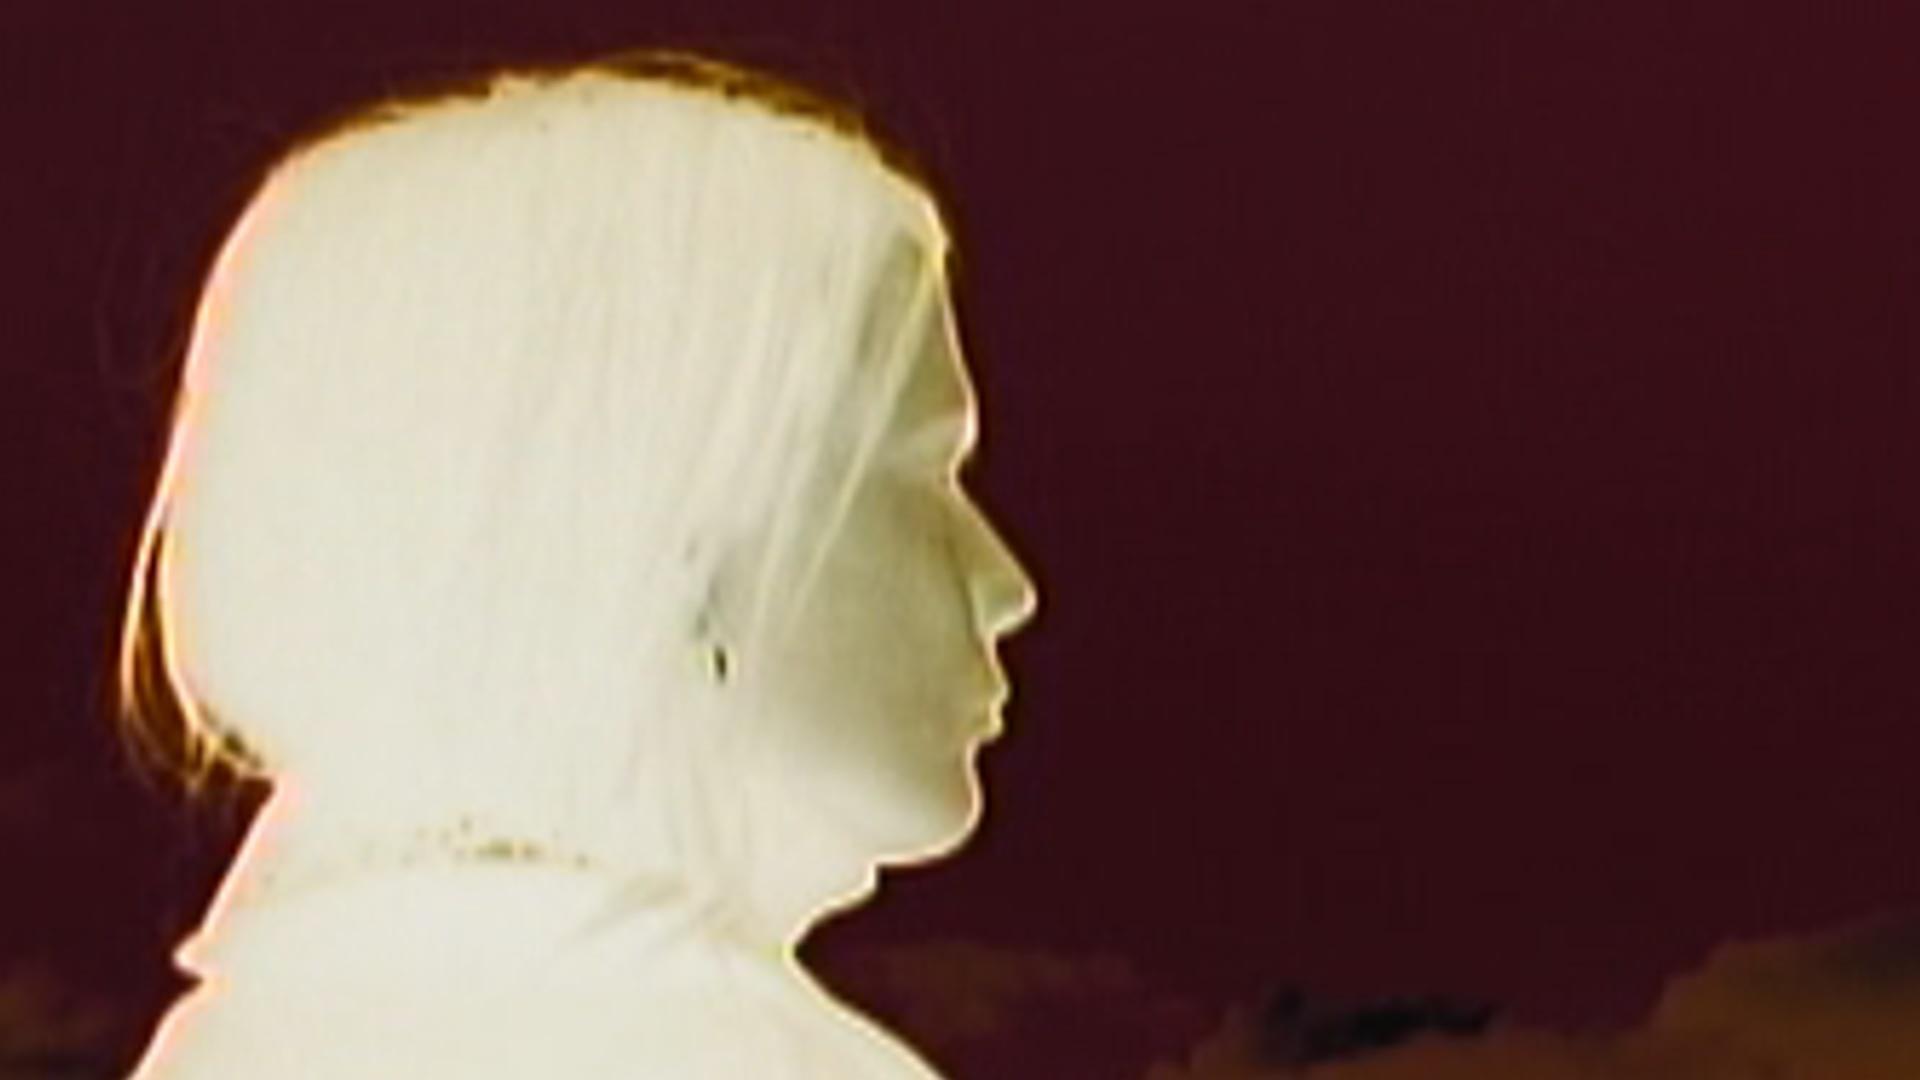 Rohan Quine, 'The Imagination Thief' - film 'MARC 5', still 14